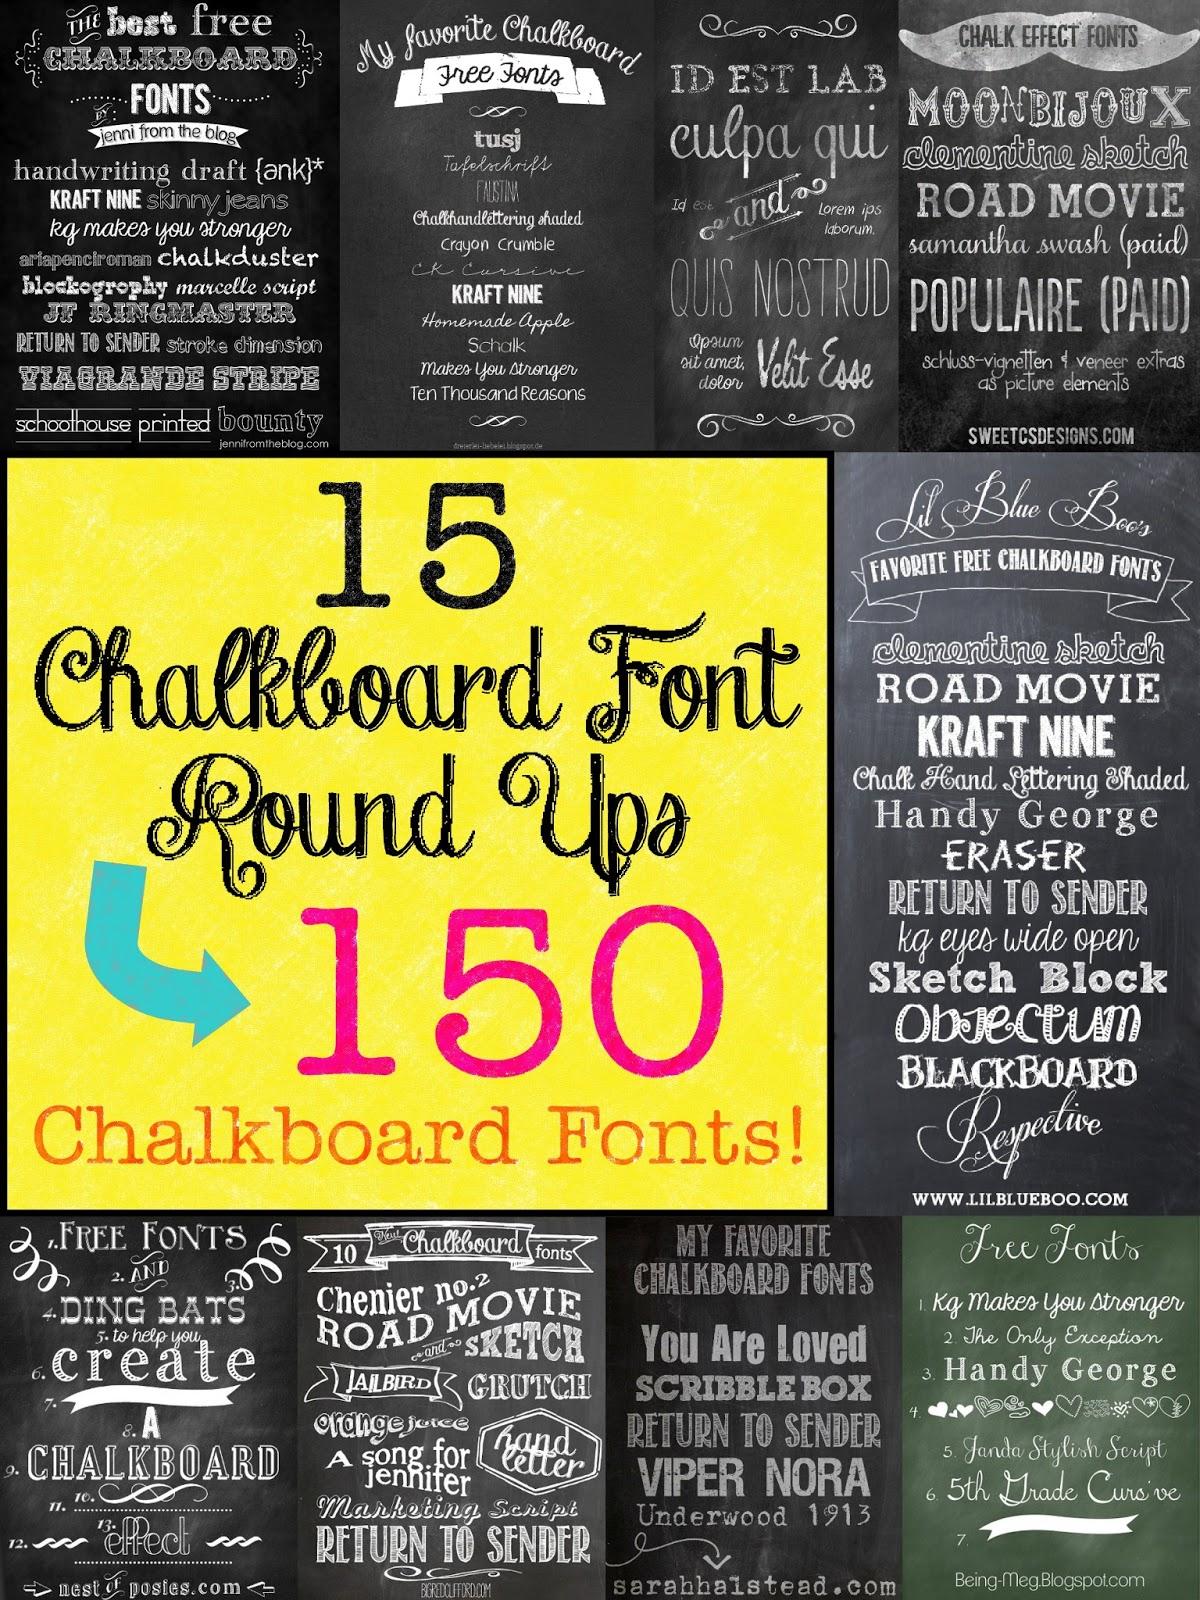 Mega Chalkboard Font Round Up! - The Scrap Shoppe